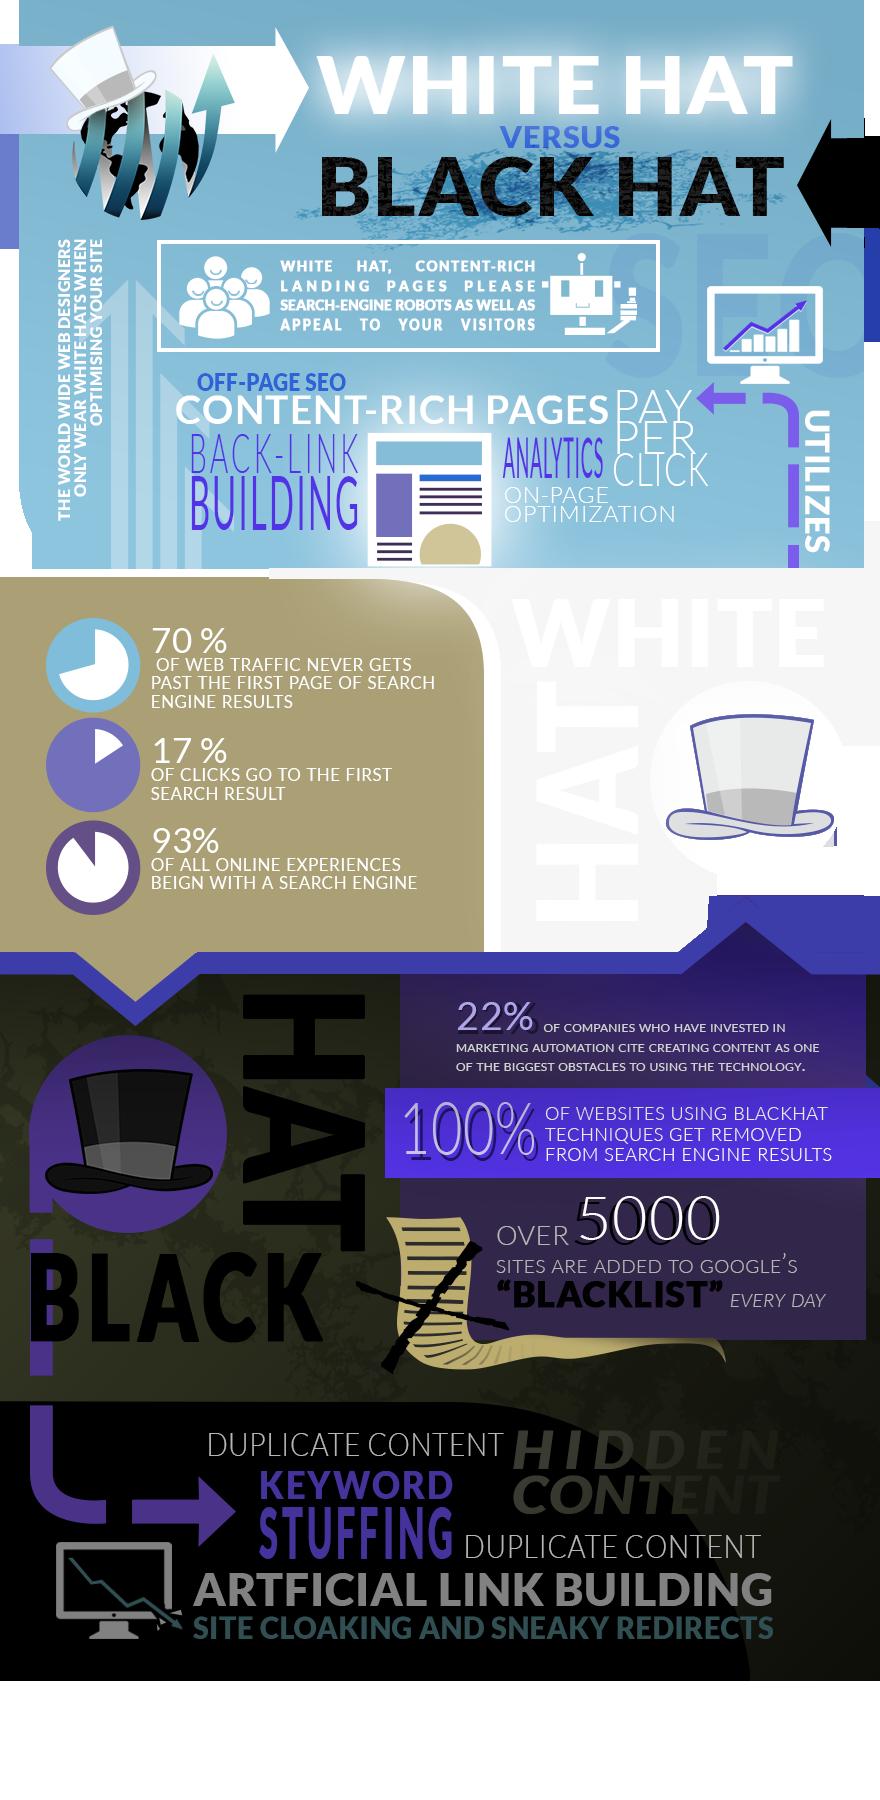 White Hat SEO Versus Black Hat SEO   The Do's & Don'ts   W3D